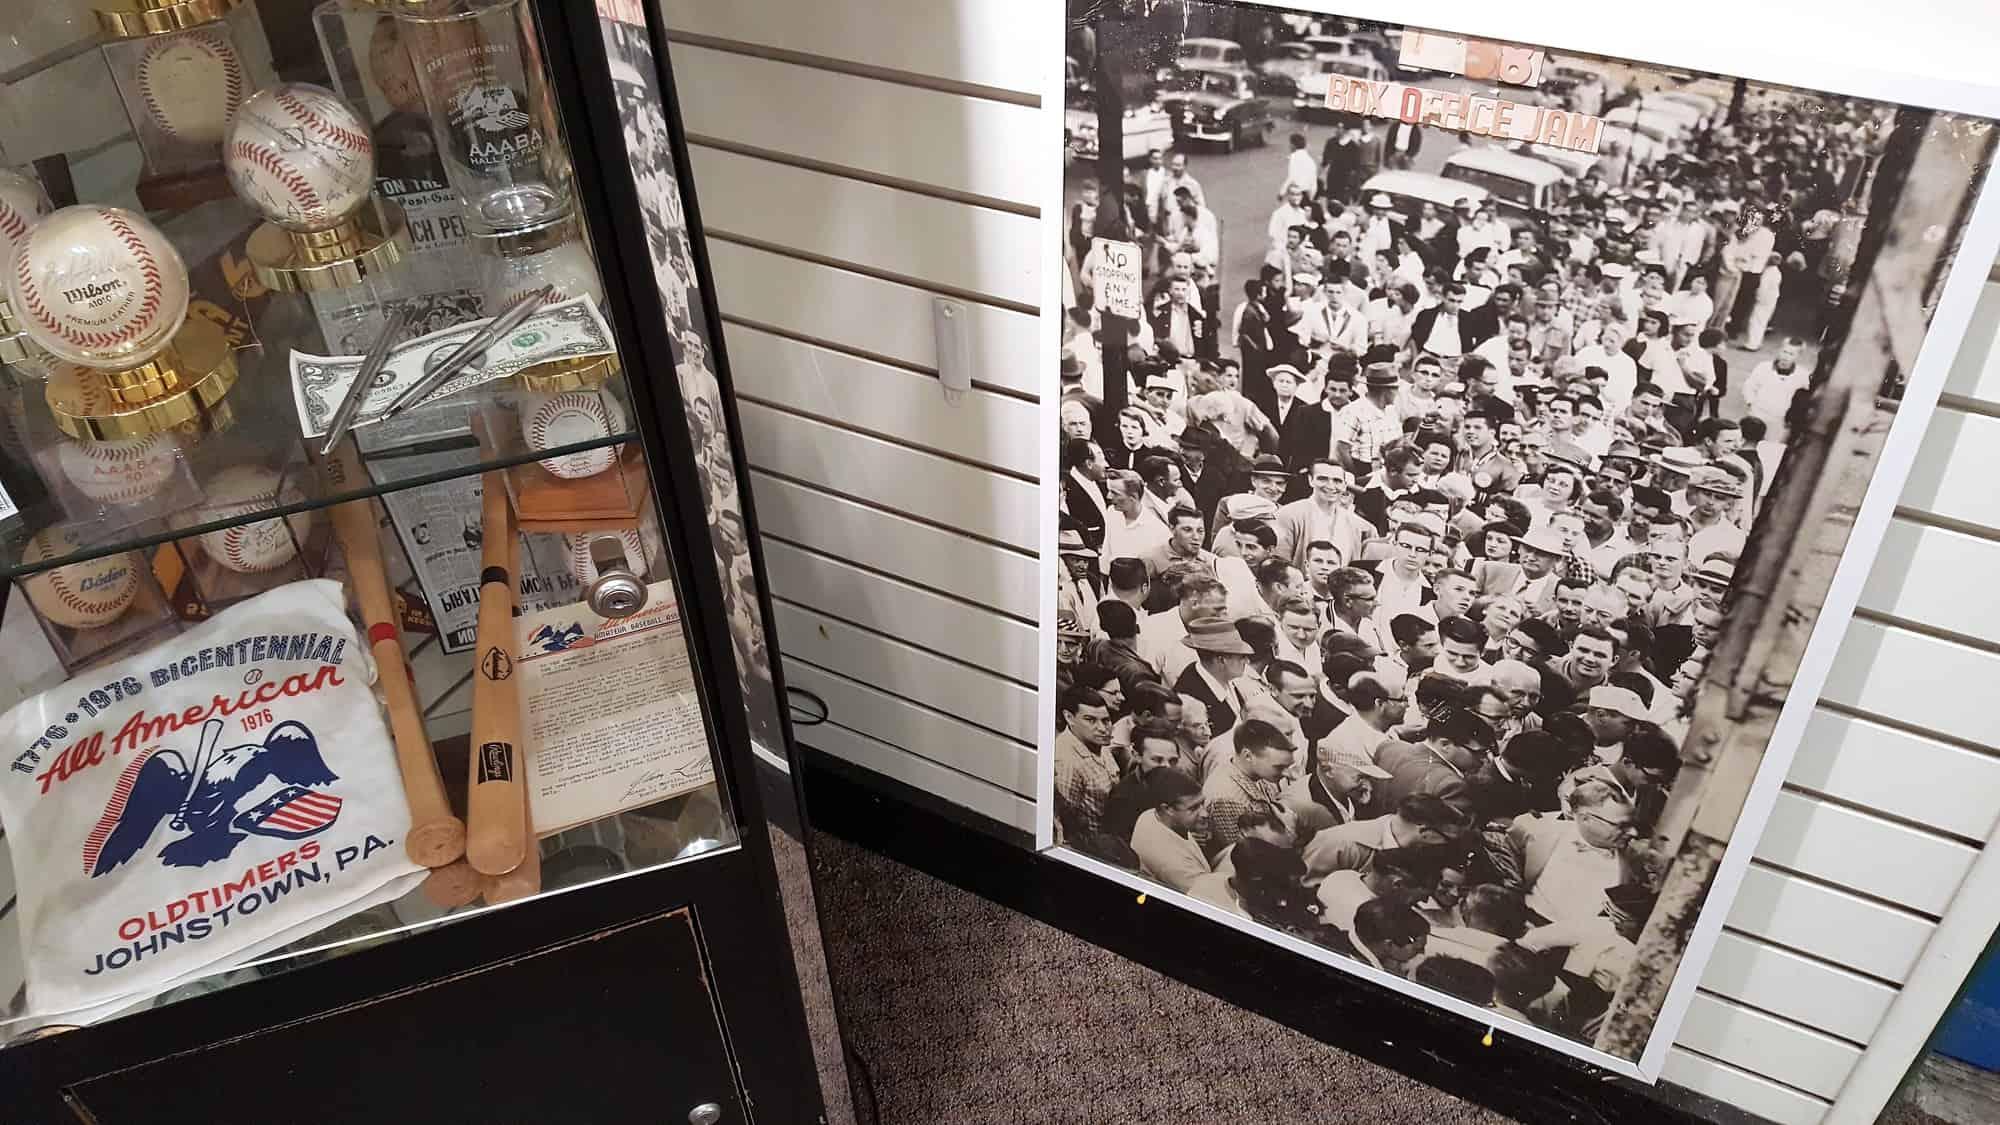 AAABA HOF photo of 1958 crowd